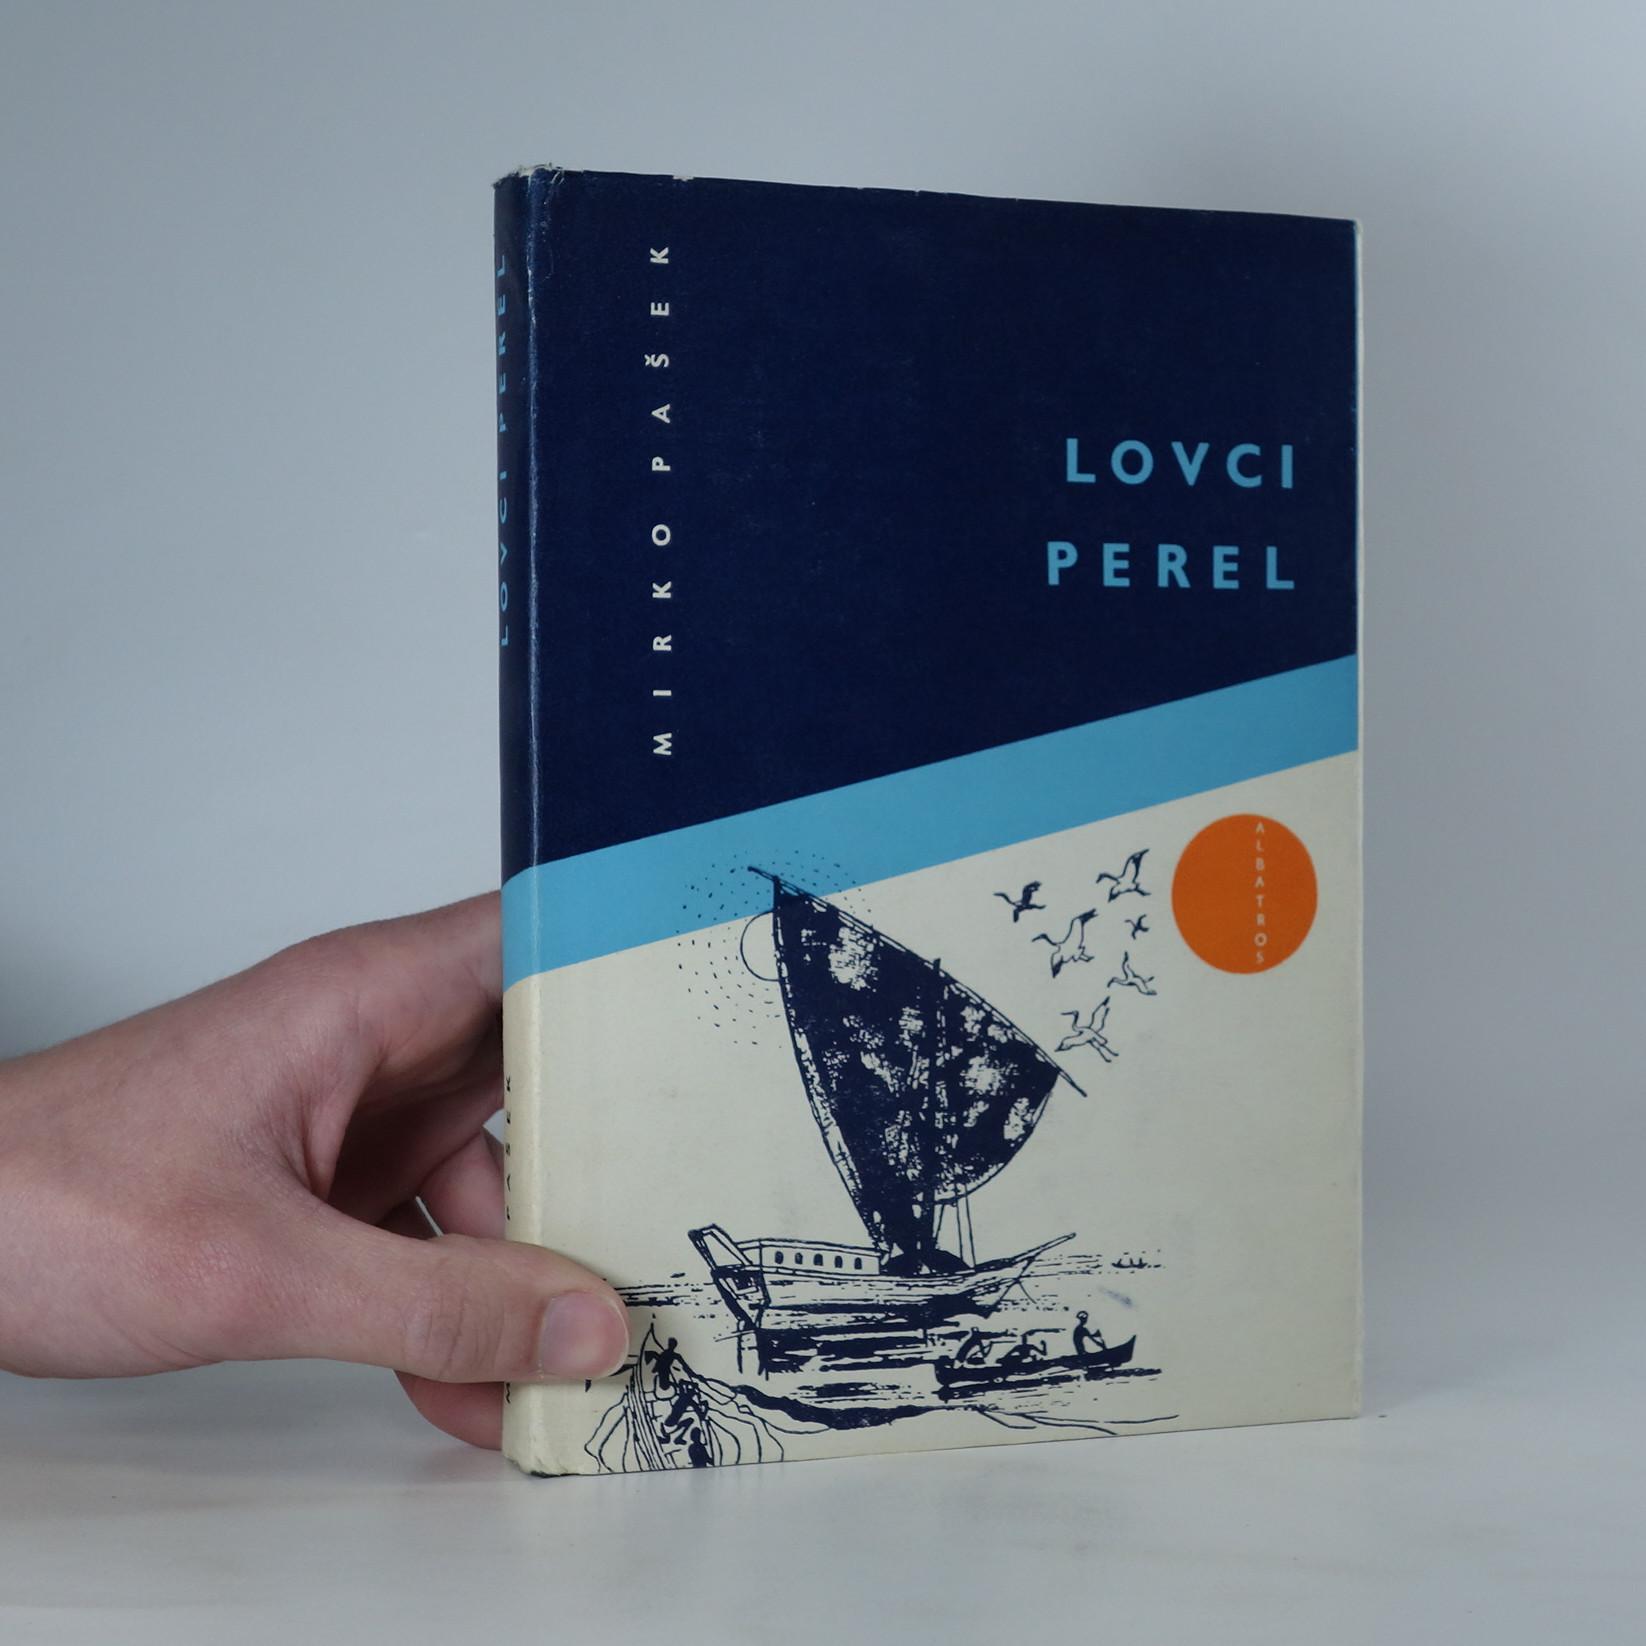 antikvární kniha Lovci perel, 1969